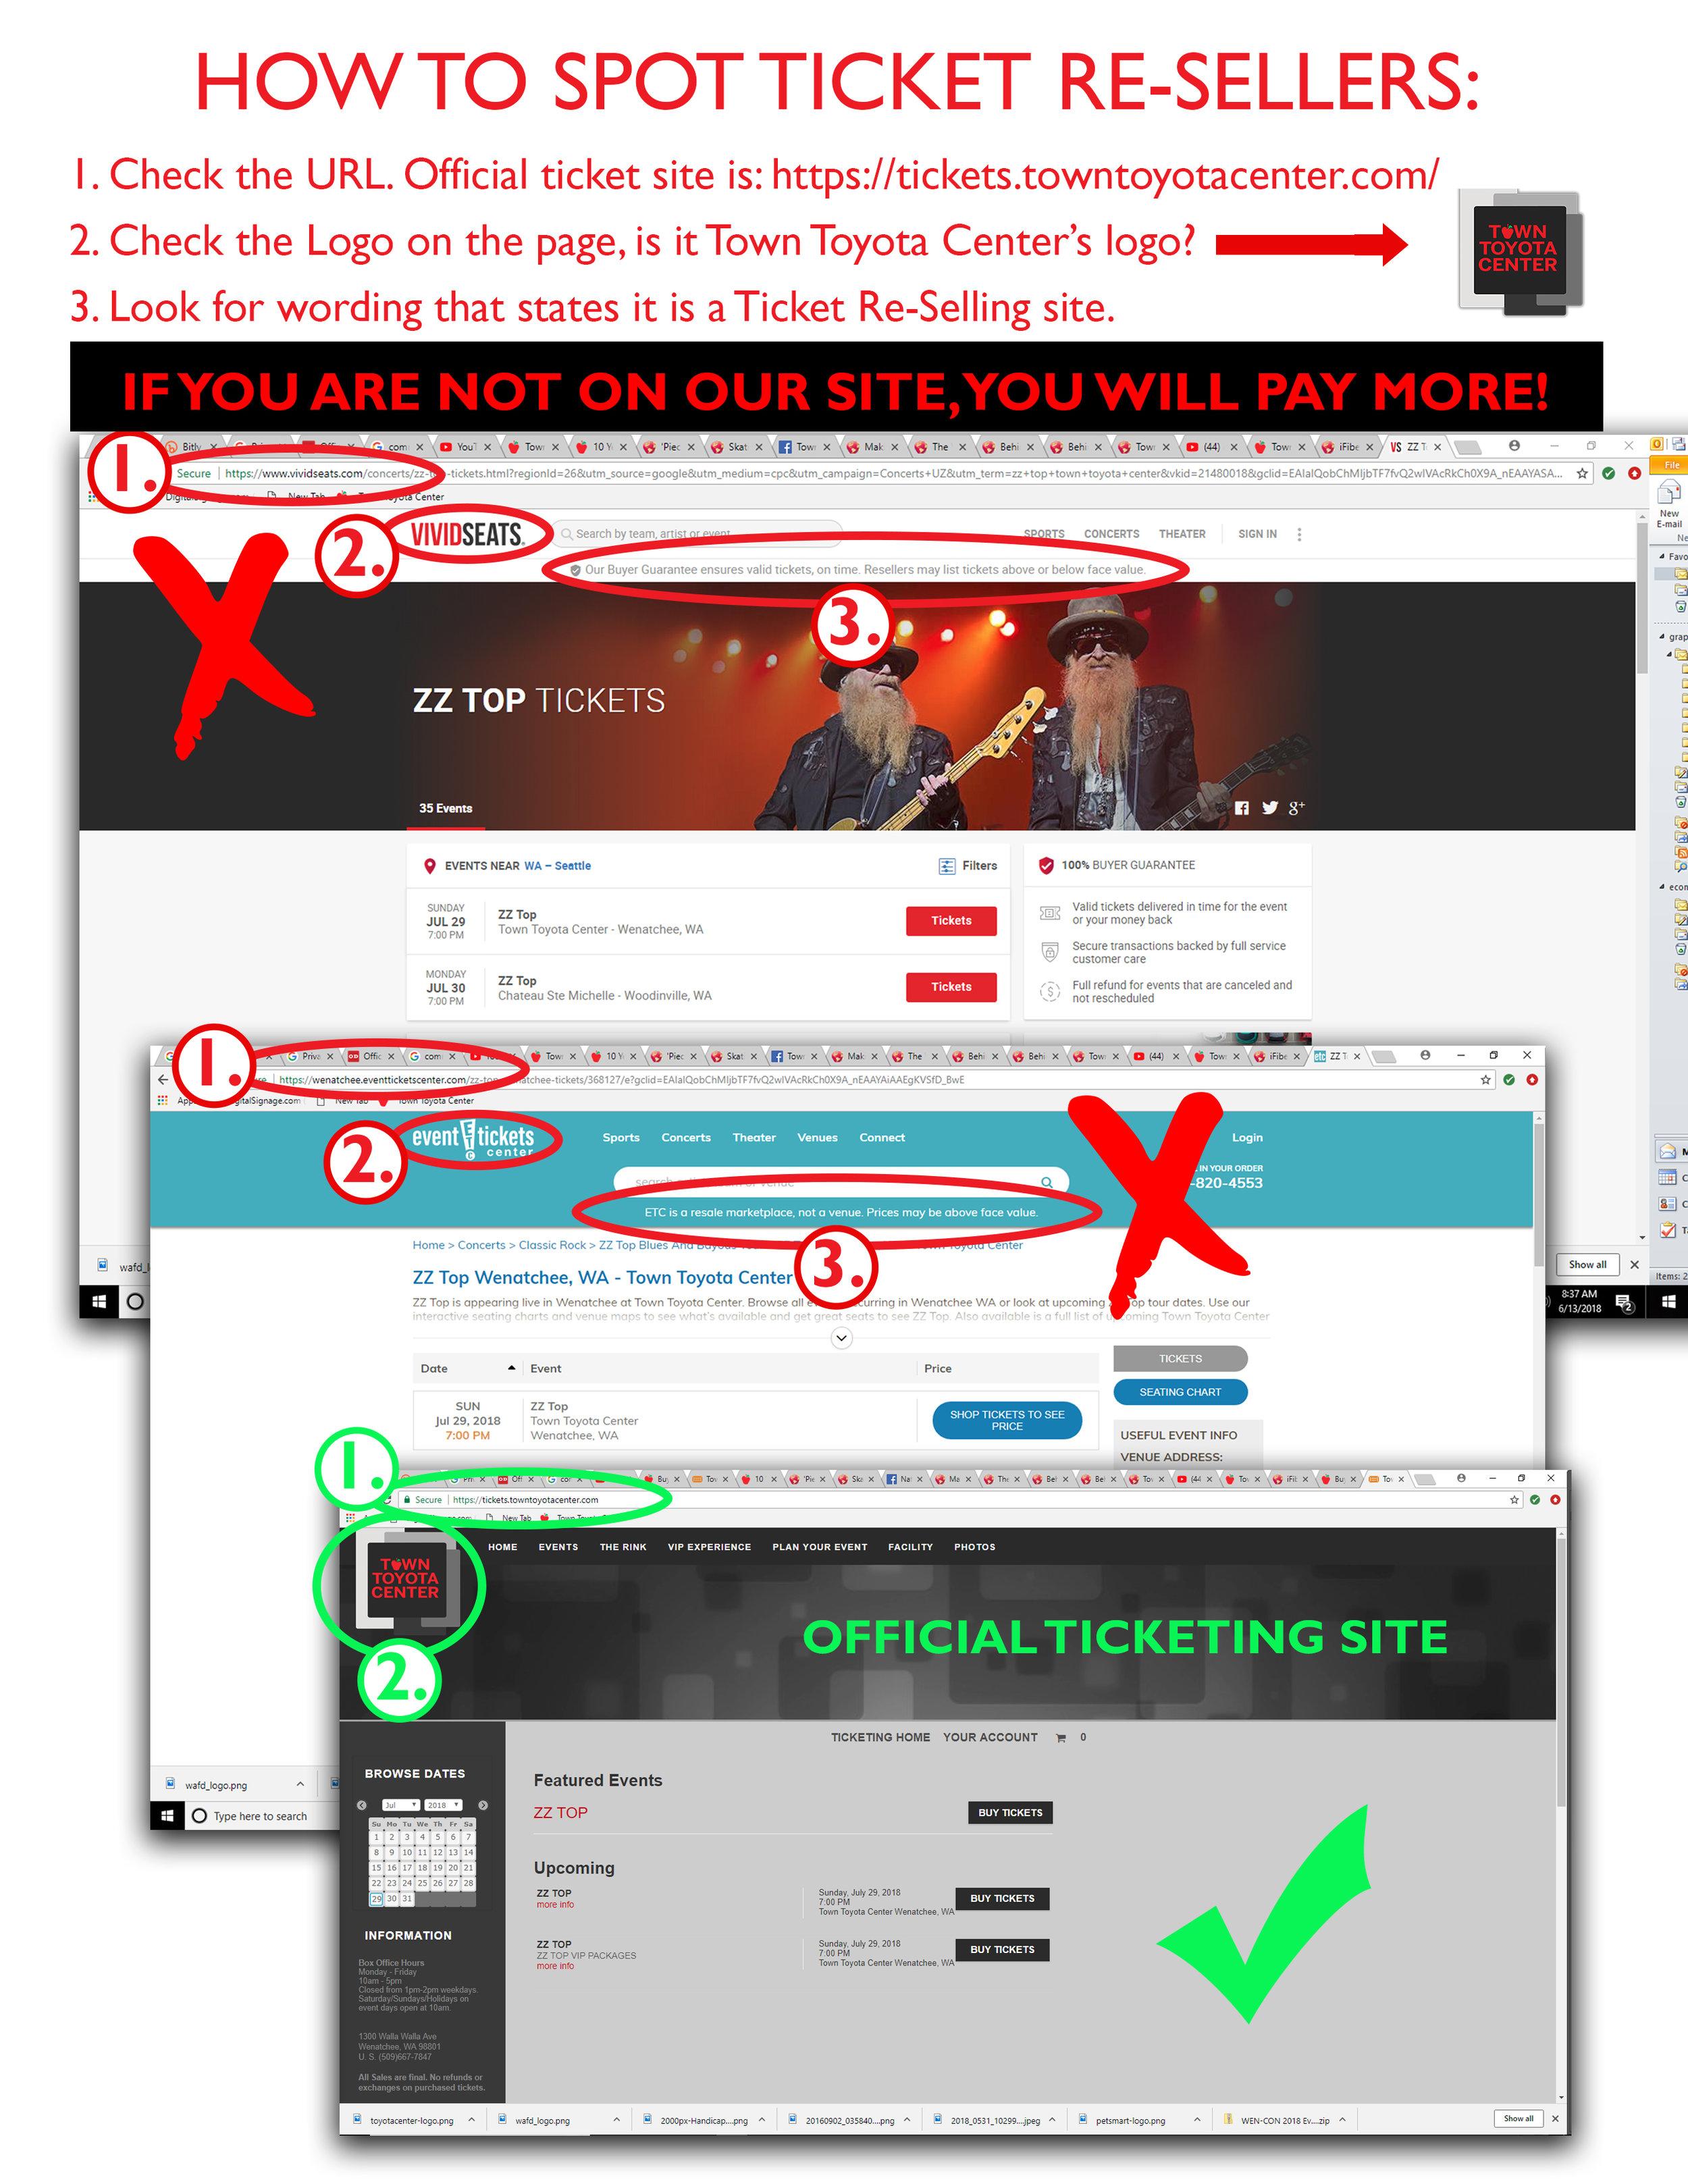 Ticket Reseller graphic.jpg